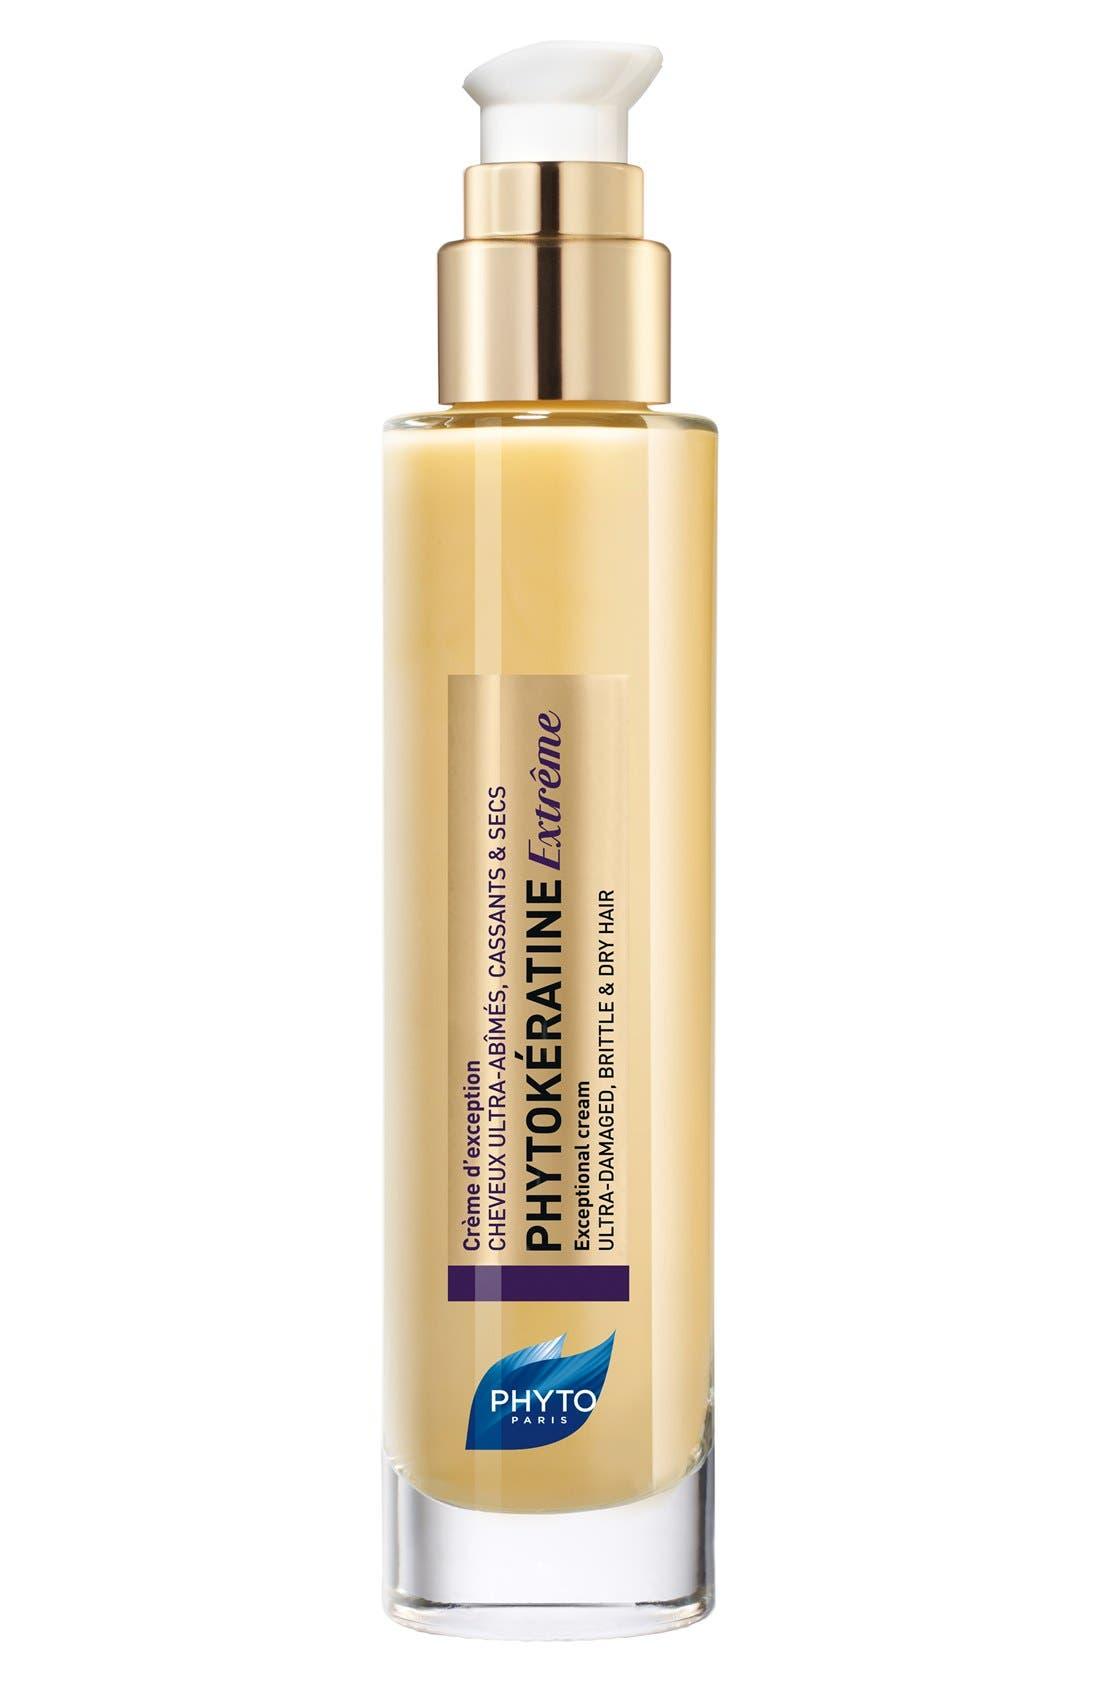 PHYTO Phytokératine Extrême Exceptional Cream